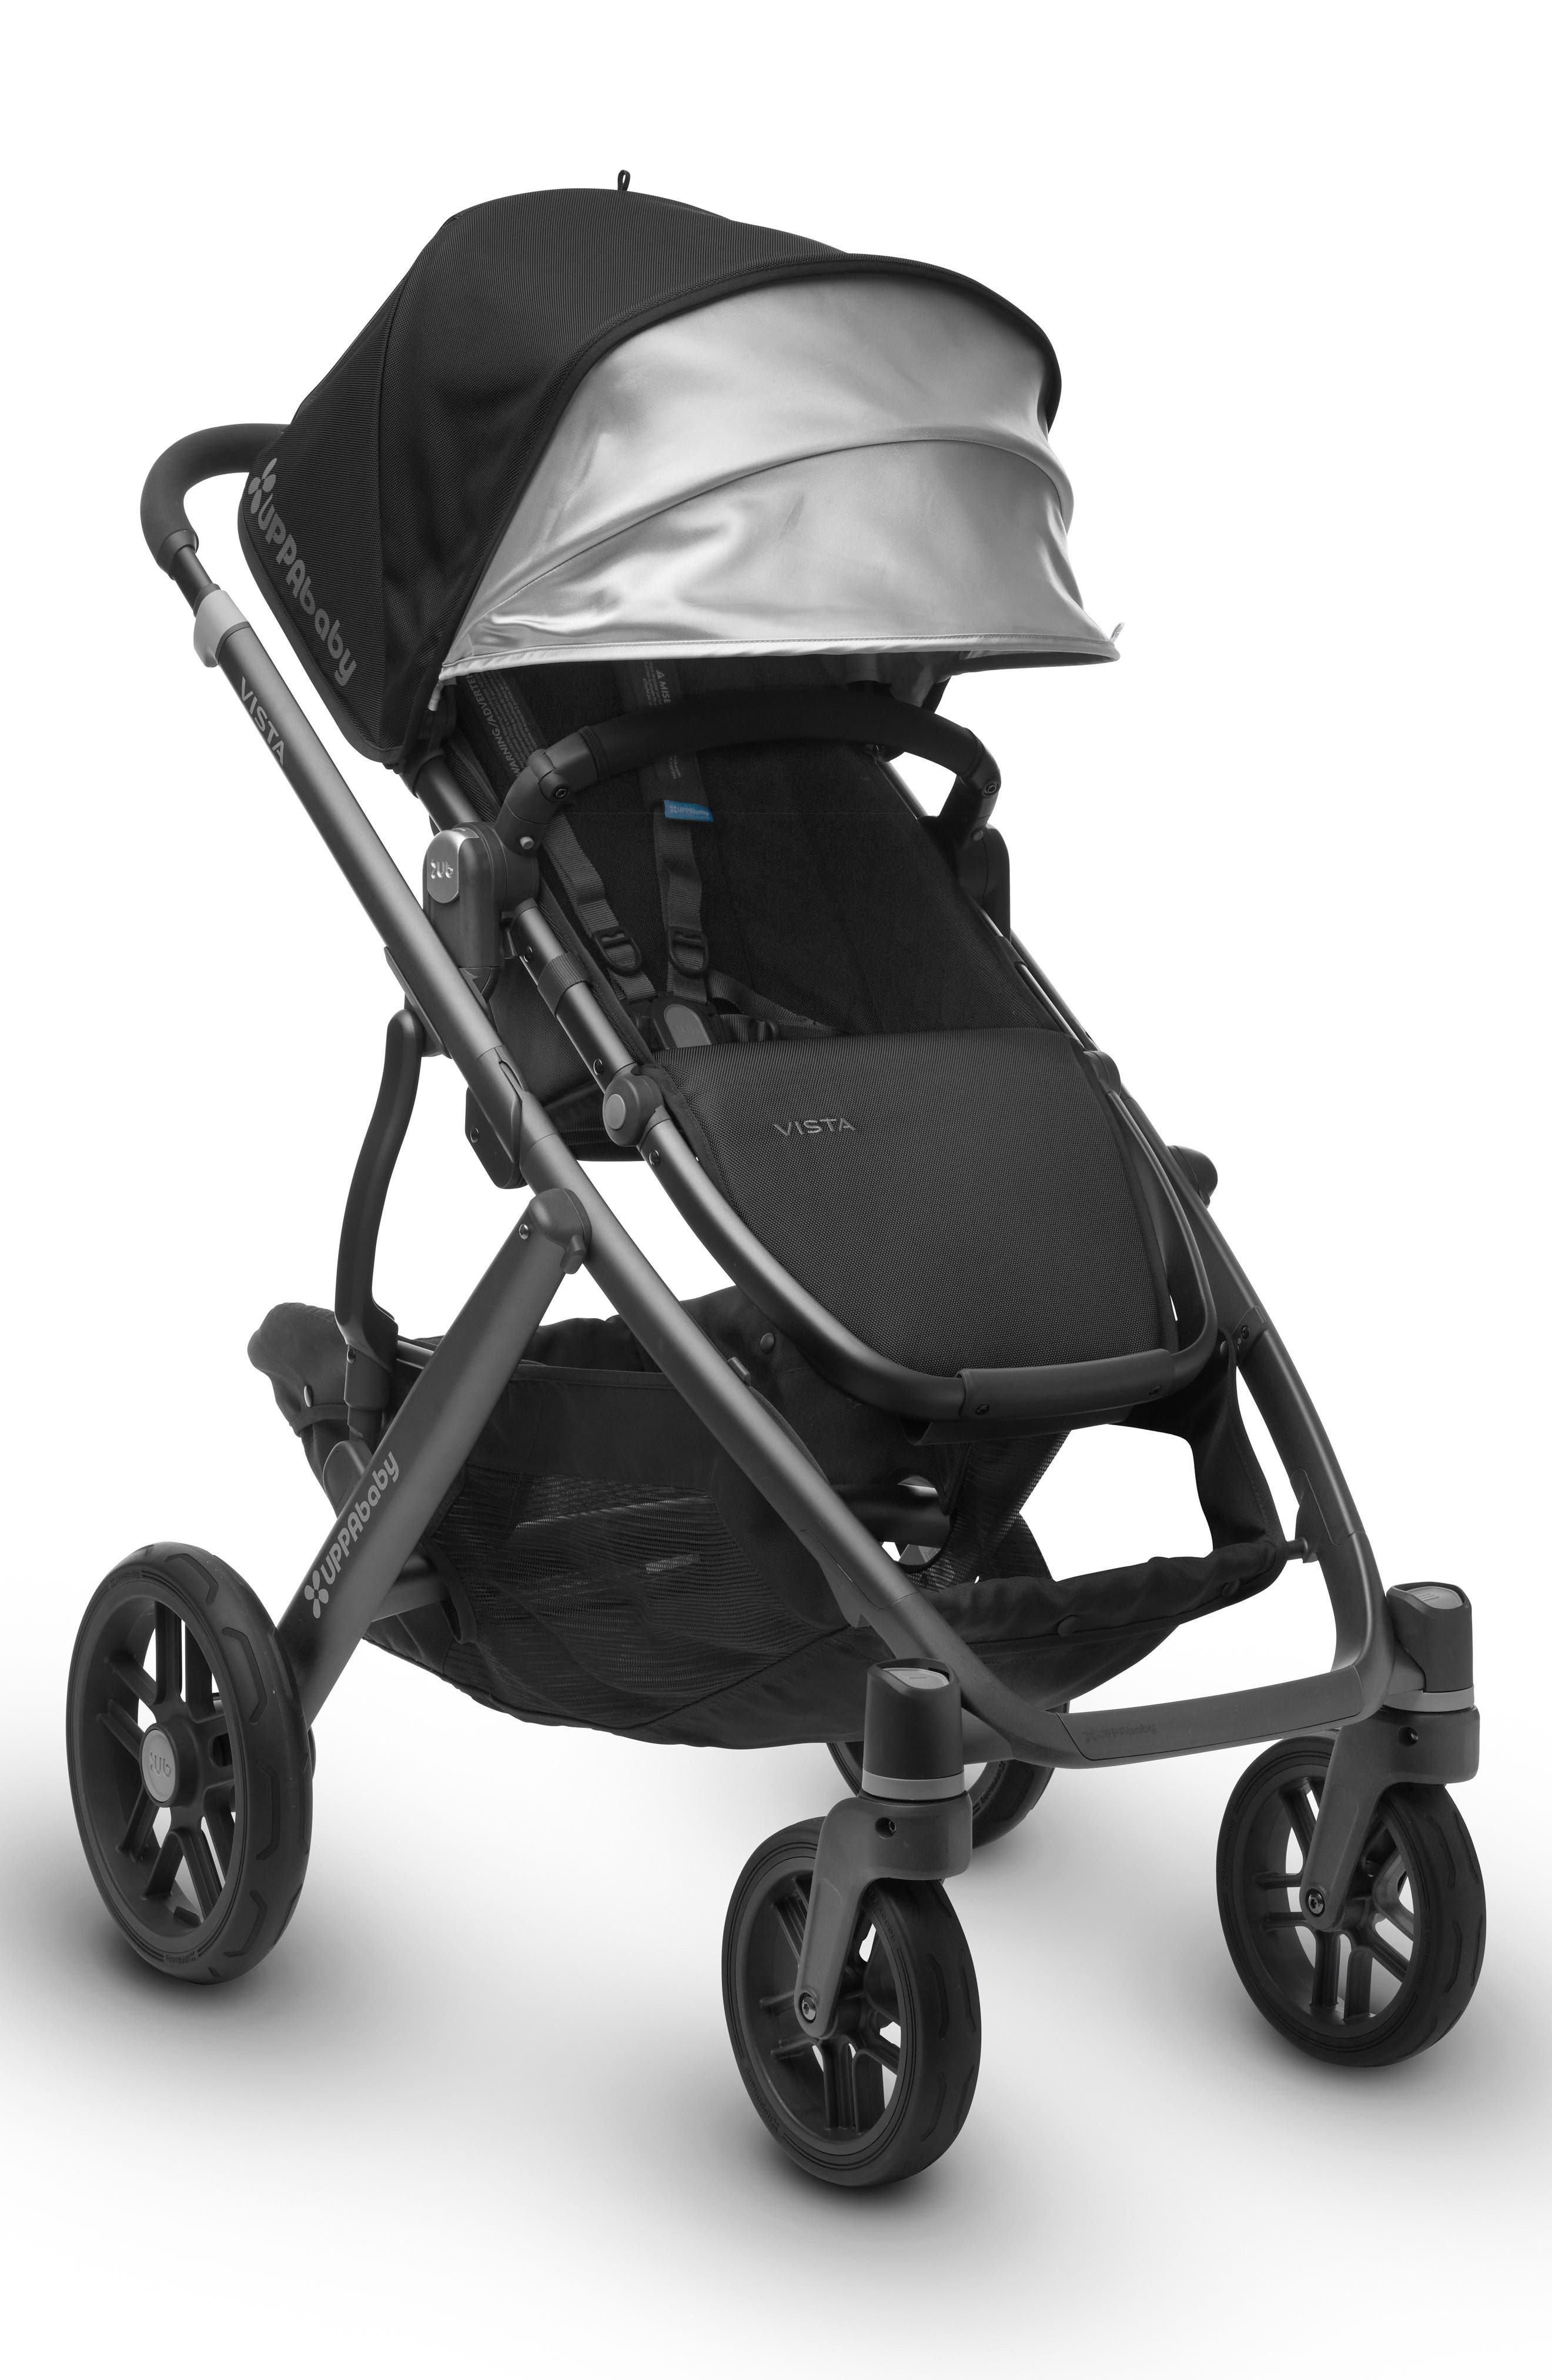 2017 VISTA Aluminum Frame Convertible Stroller with Bassinet & Toddler Seat,                             Alternate thumbnail 2, color,                             001